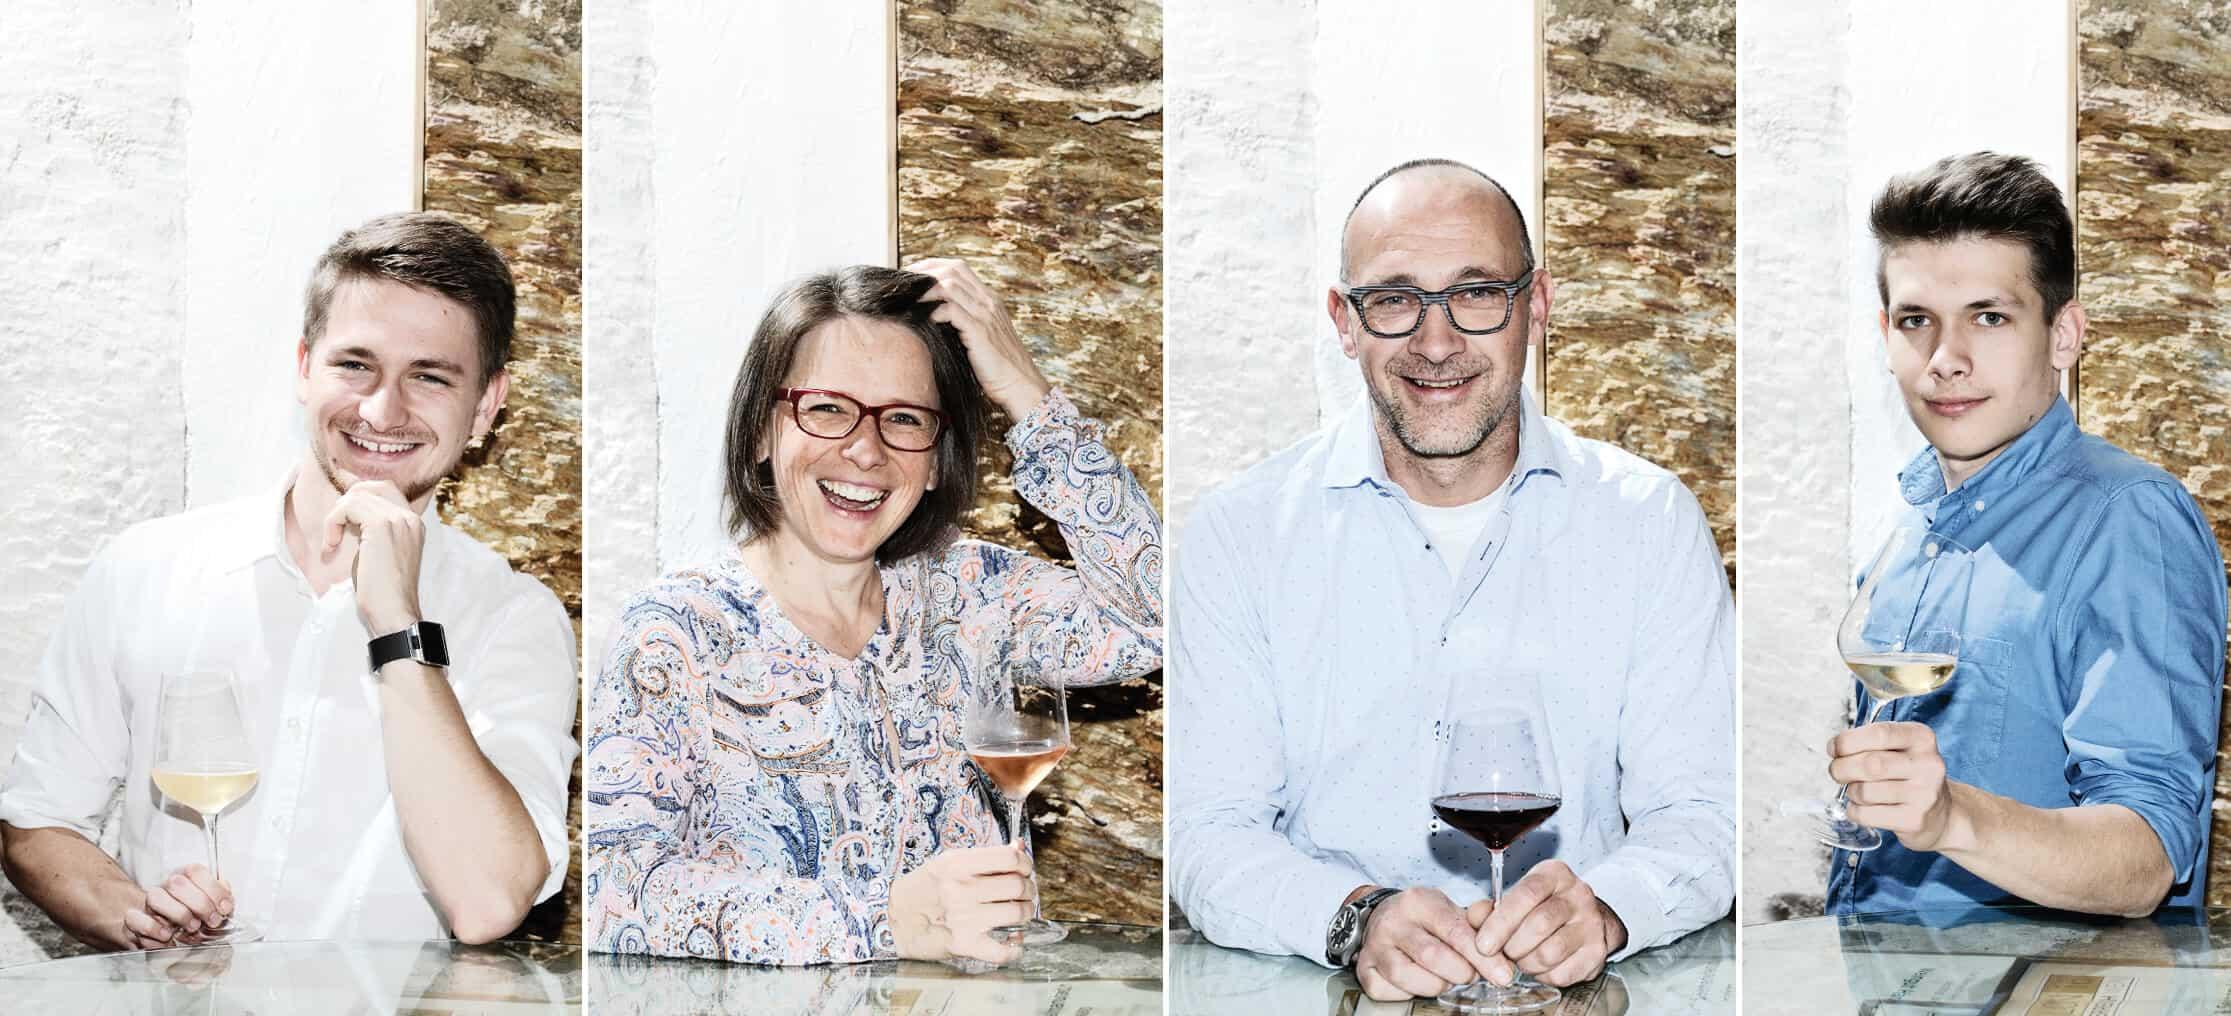 Weinkellerei Meraner Harkamp